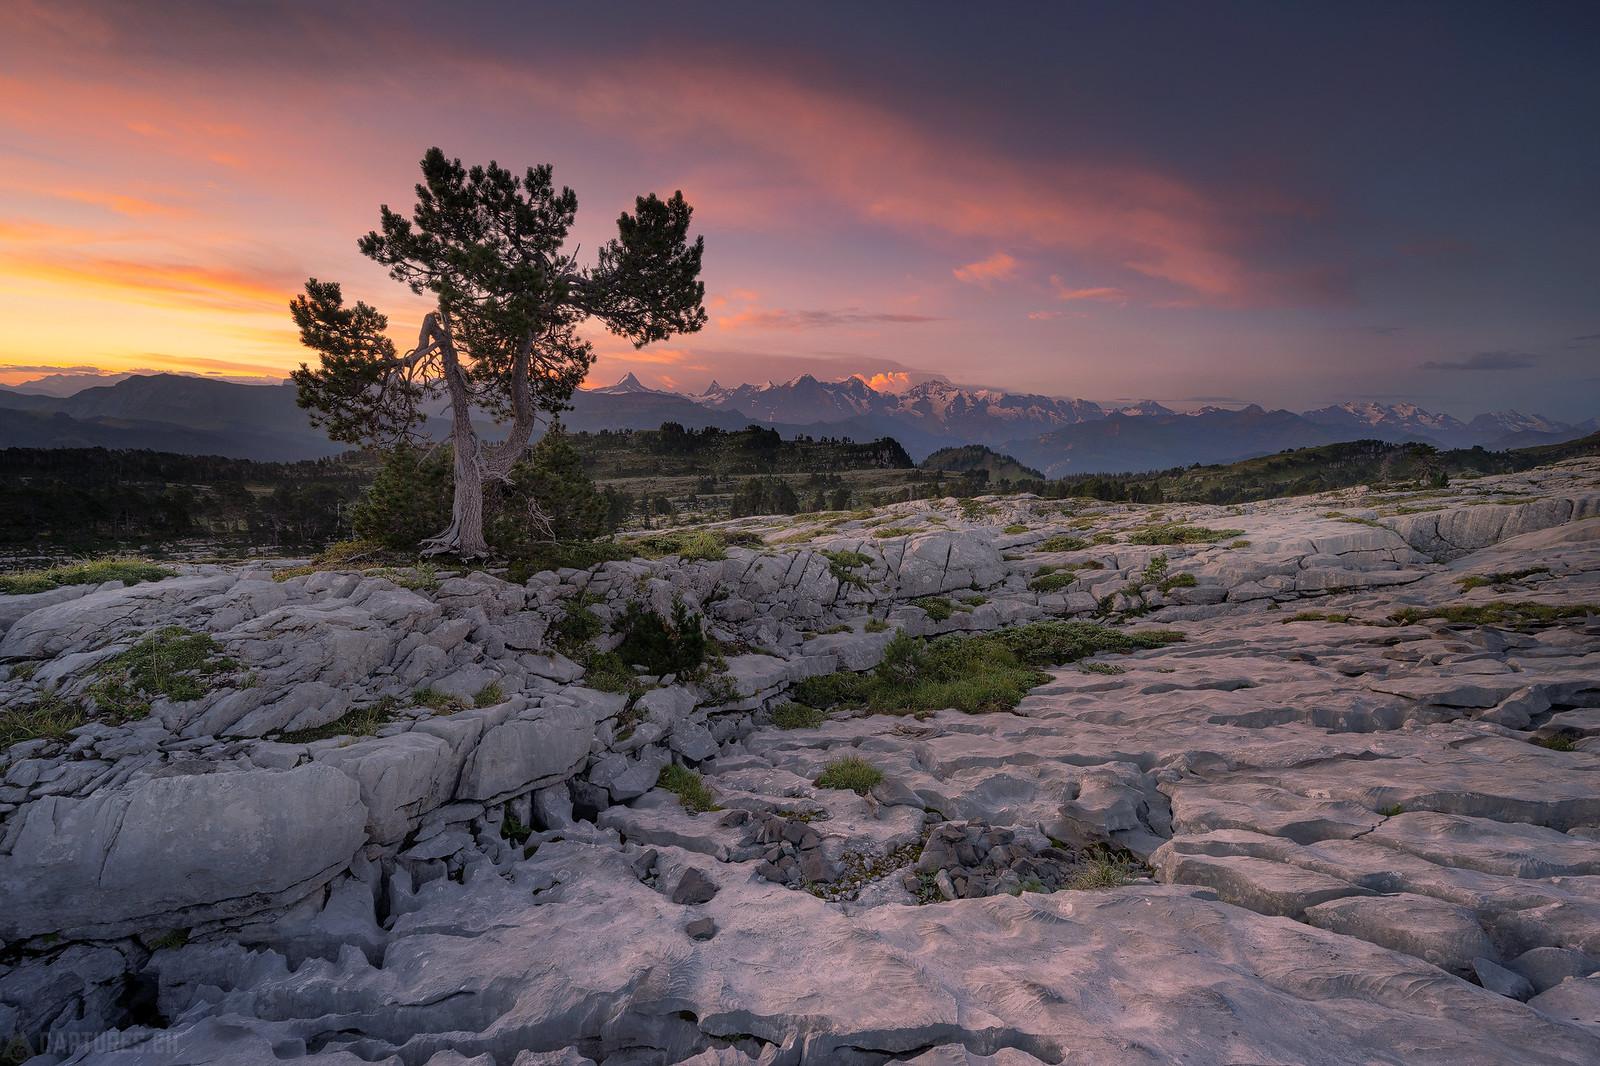 Colorful sunrise and a tree - Seefeld